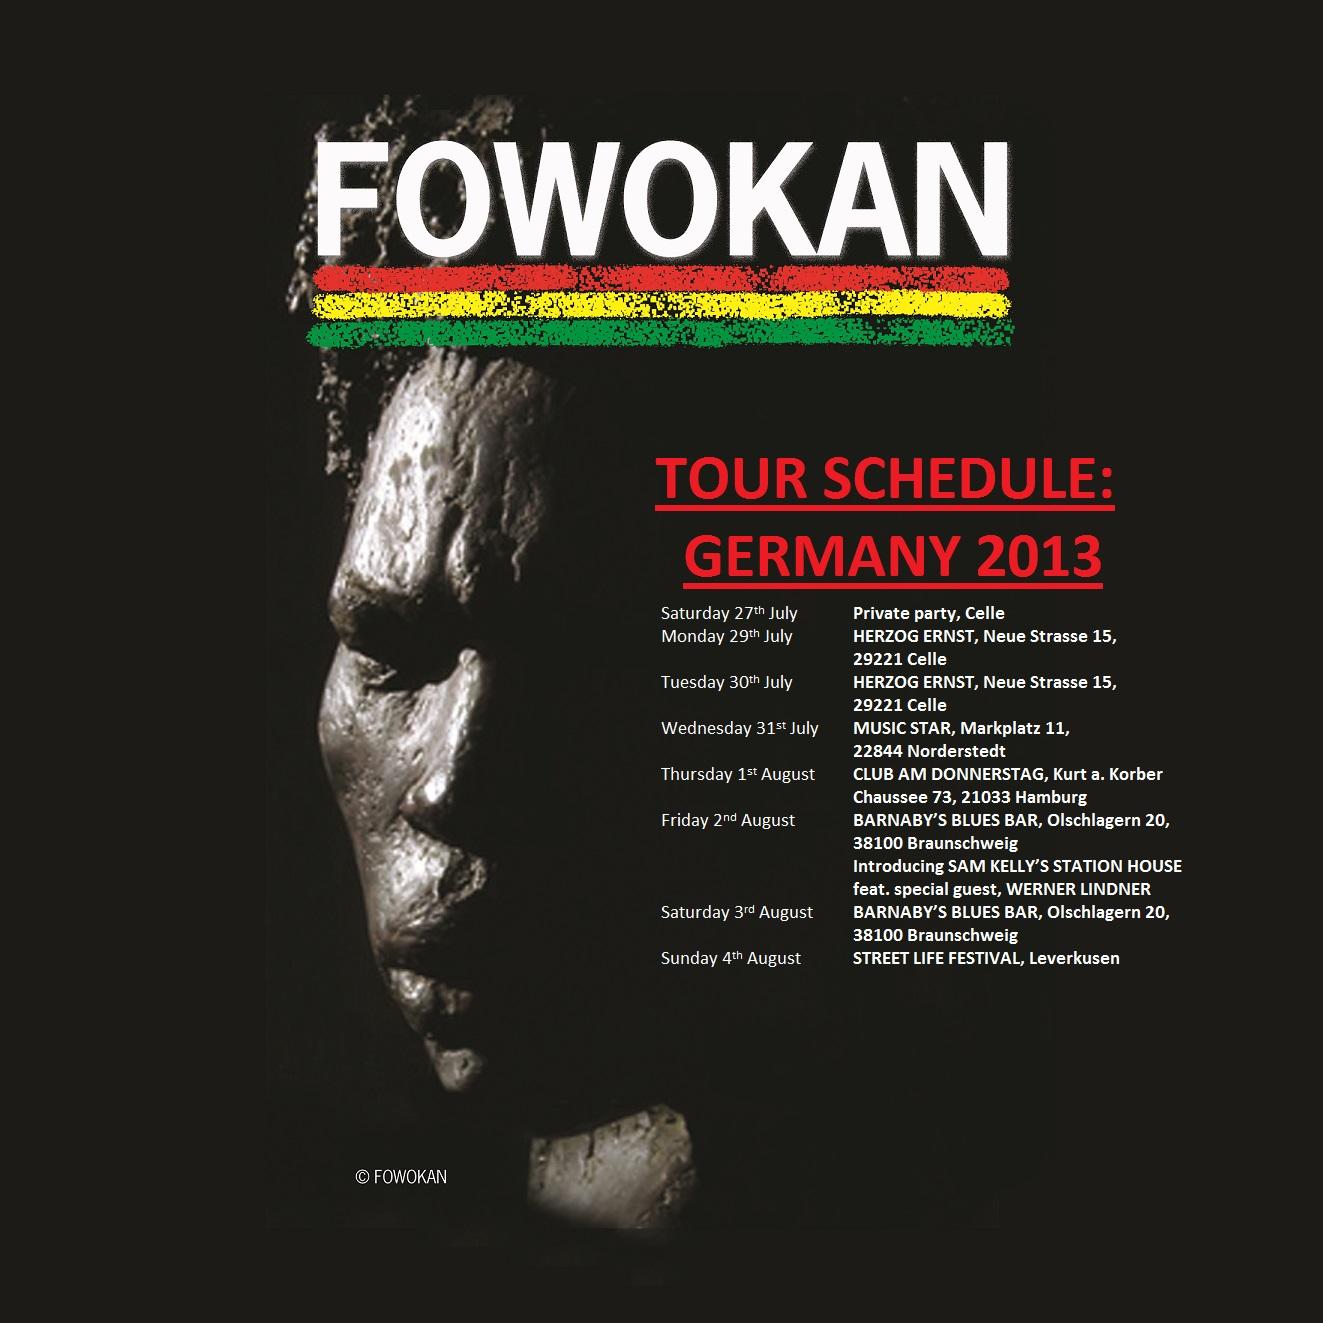 FOWOKAN TOUR SCHEDULE